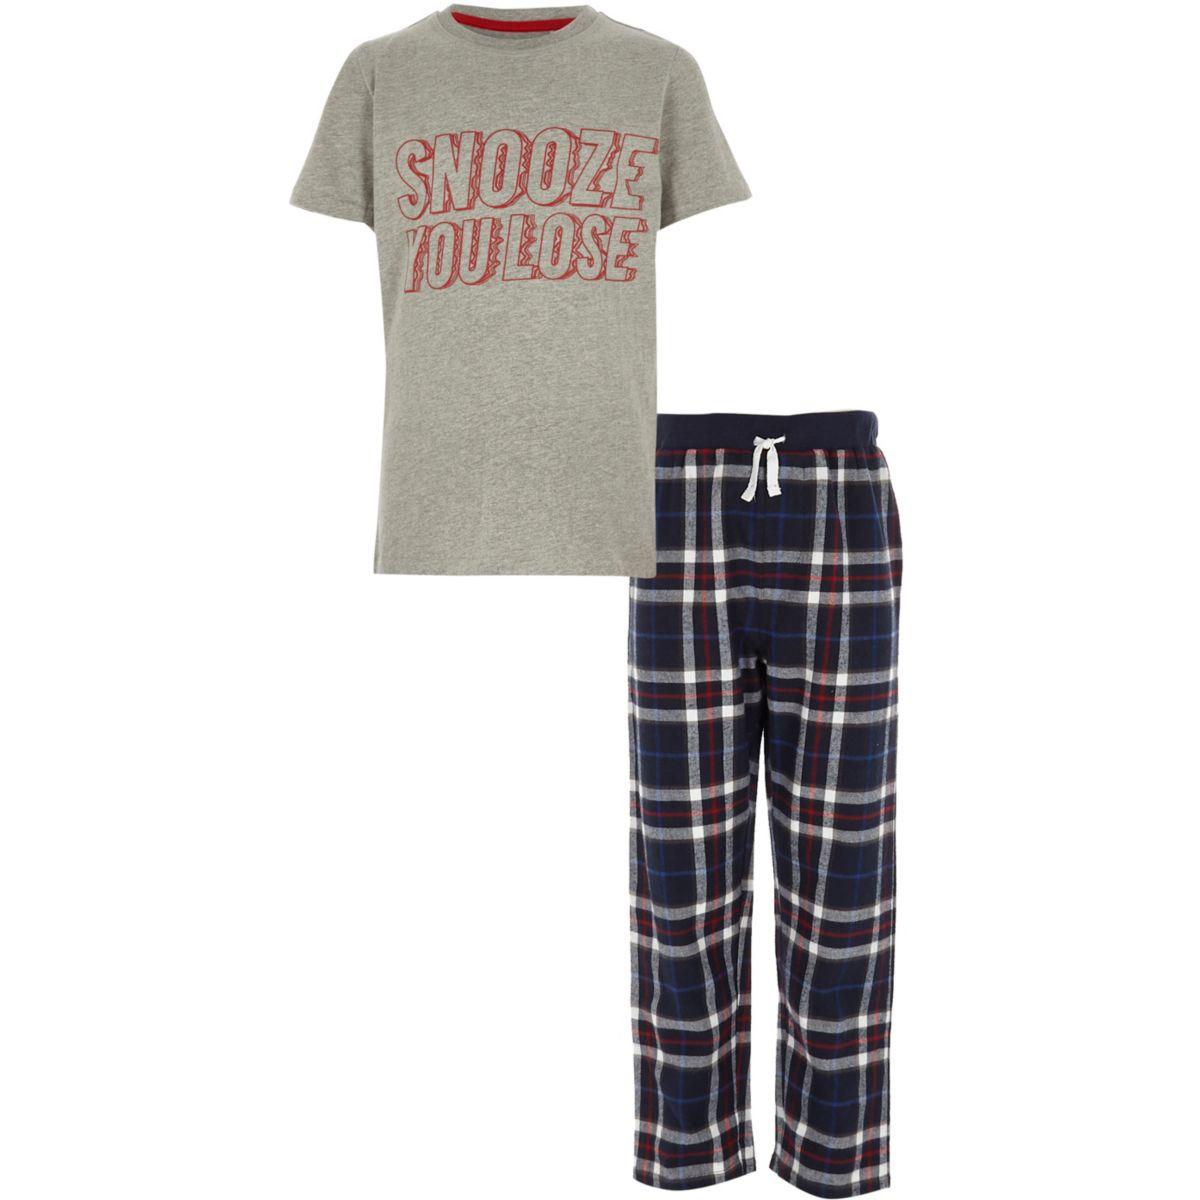 Pyjama «snooze you lose» gris pour garçon